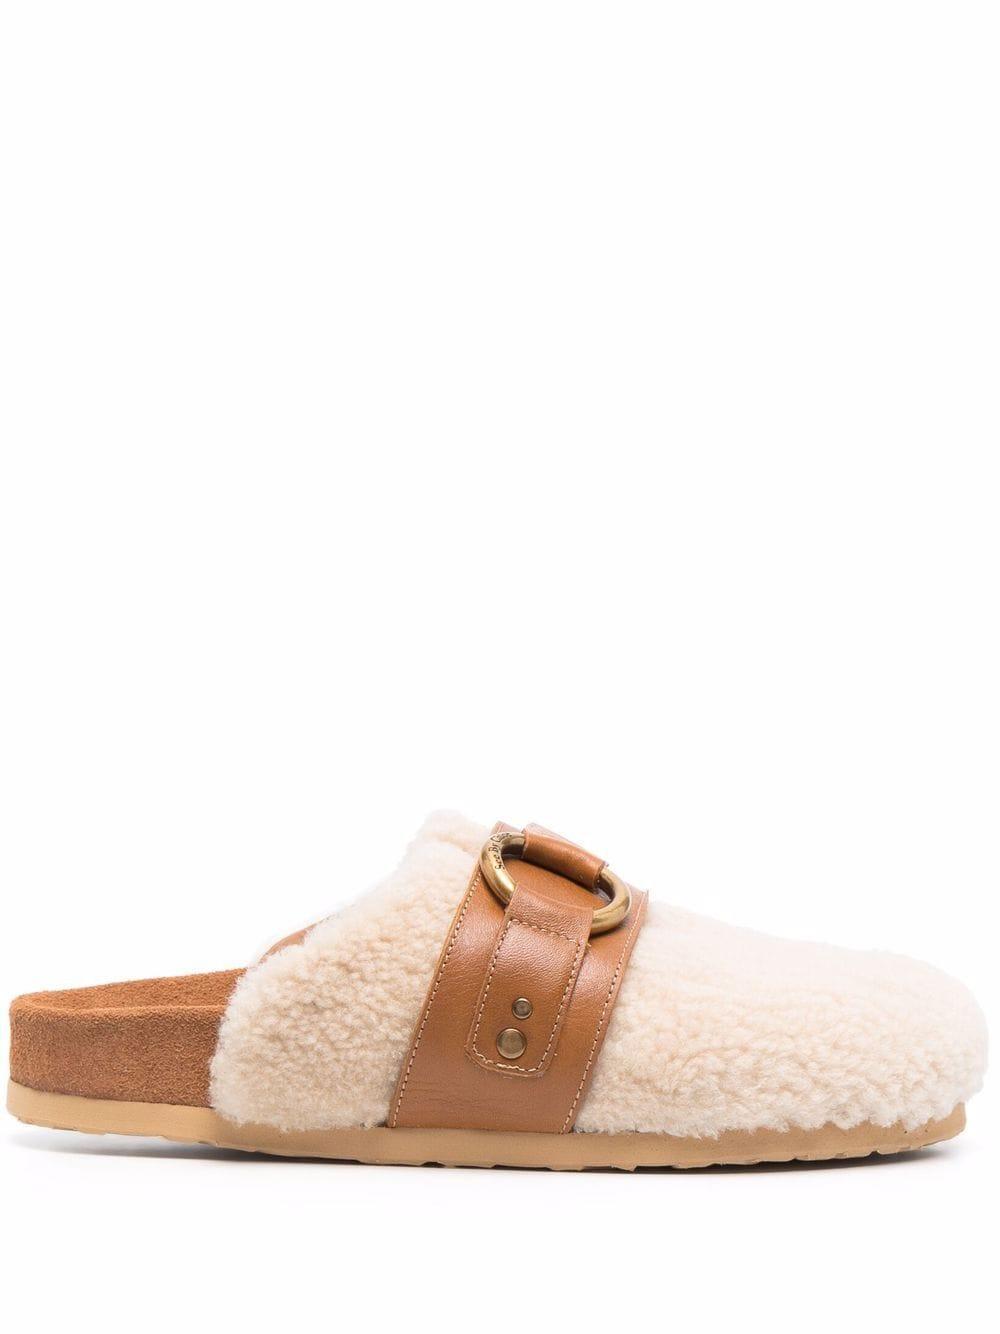 Gema Shearling Flat Loafer Item # SB37181A